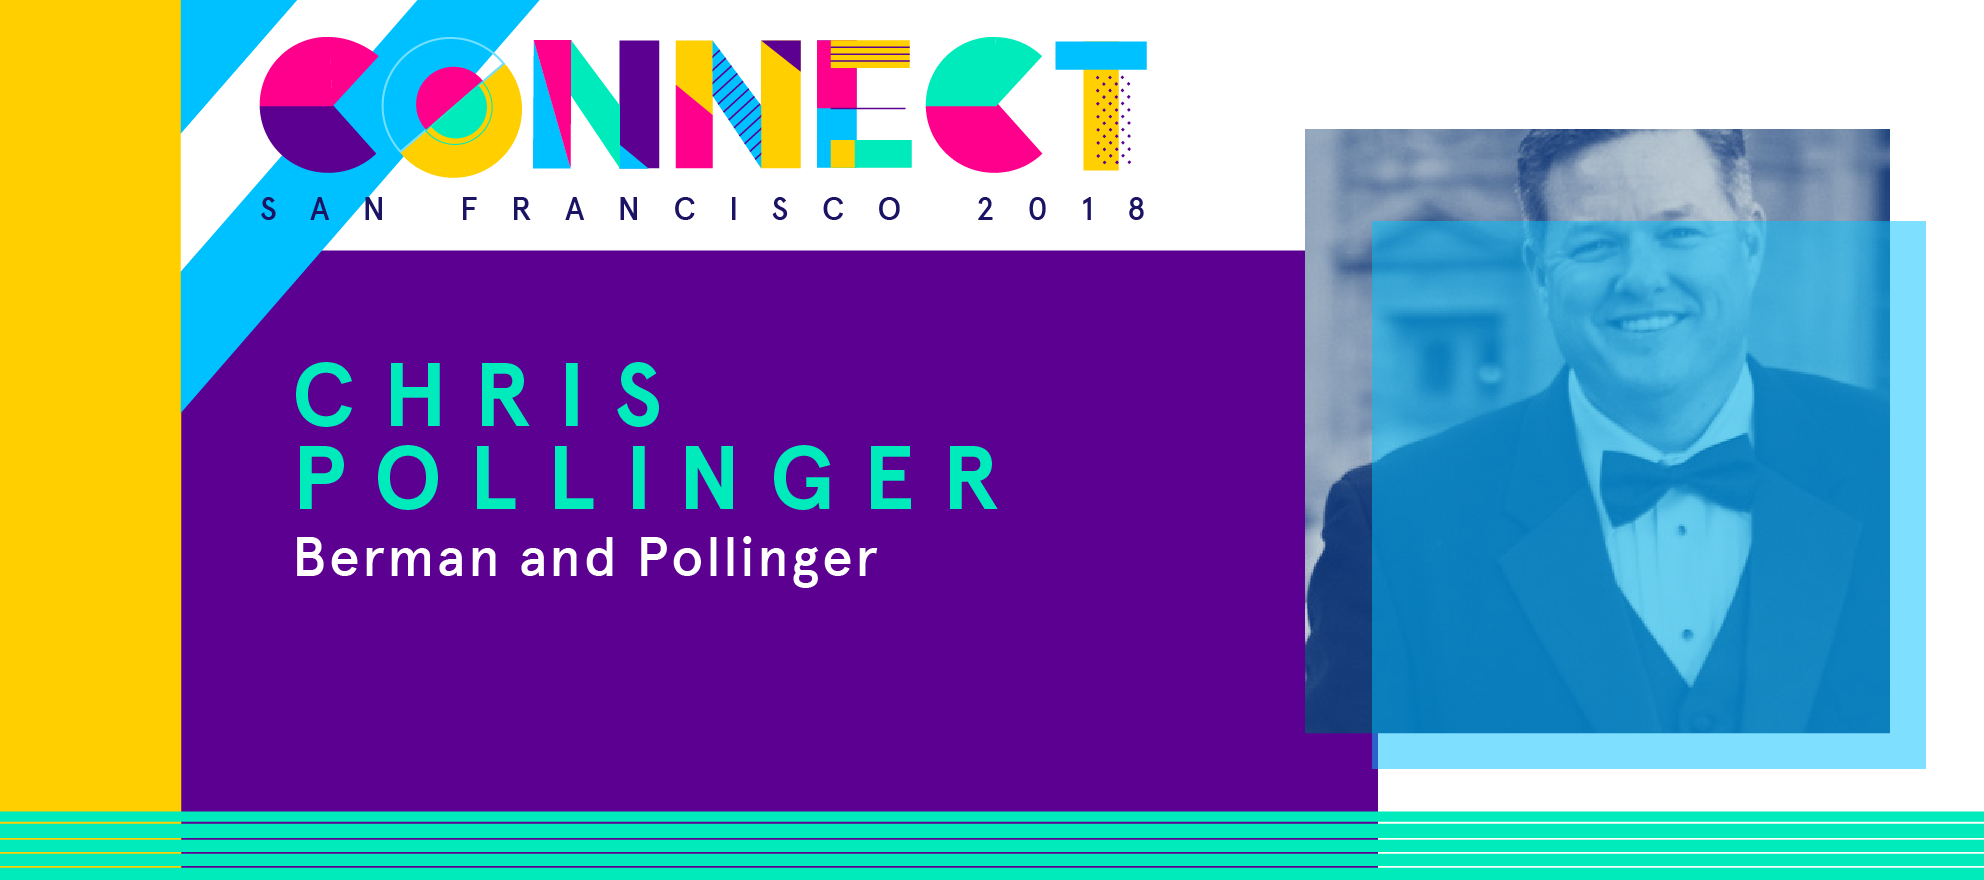 chris pollinger